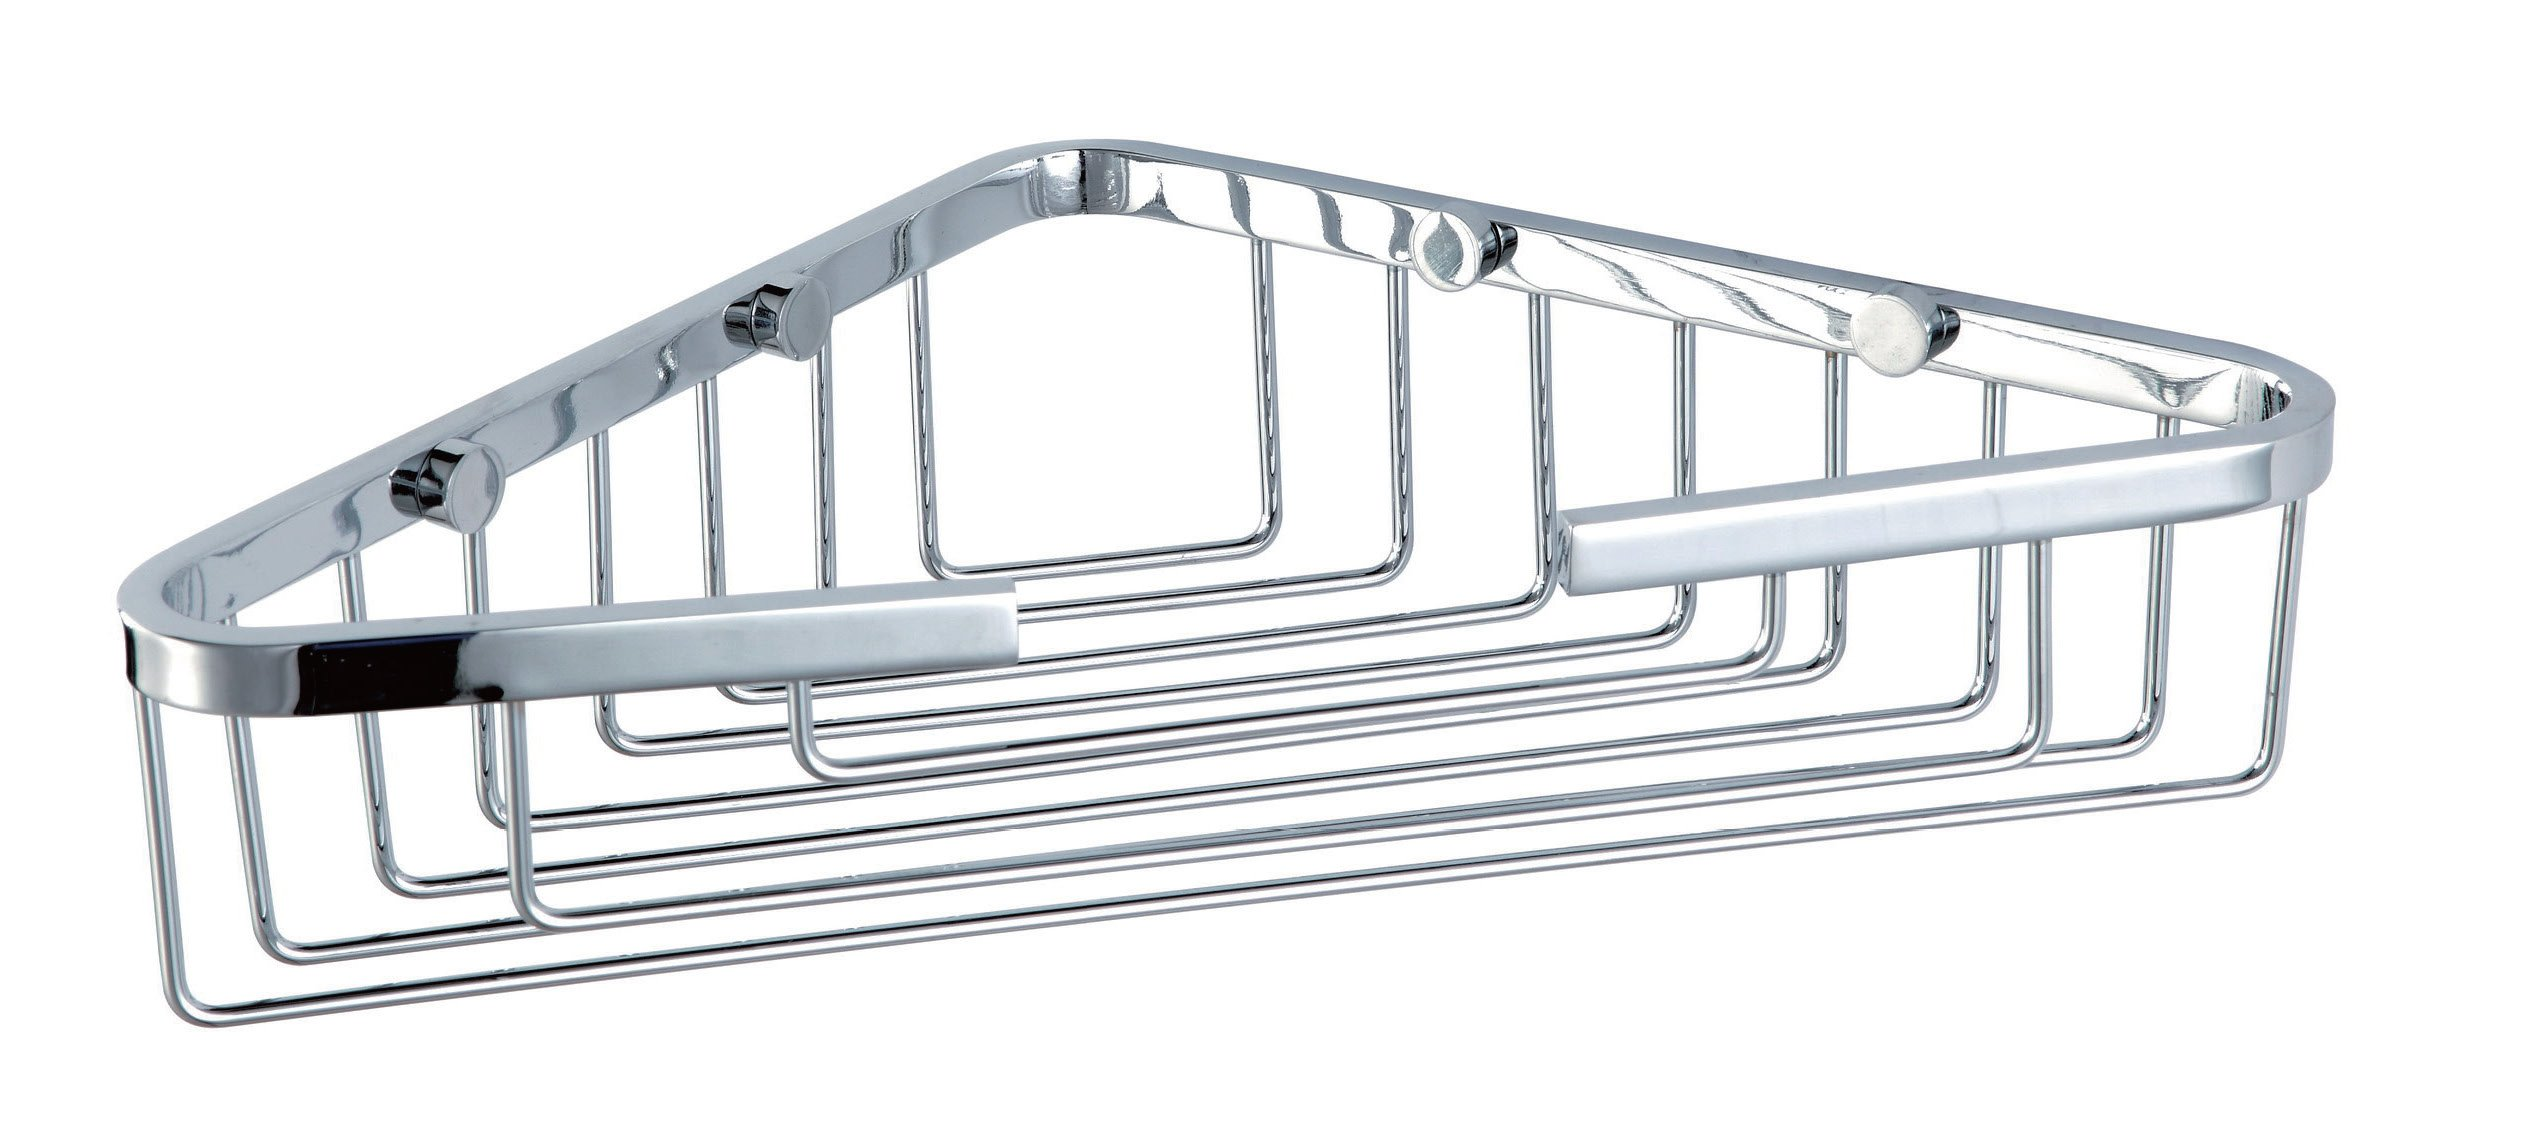 Hane HANEBATH Stainless Steel Single Tier Corner Shower Caddy Wall Mount Storage, Polished Chrome